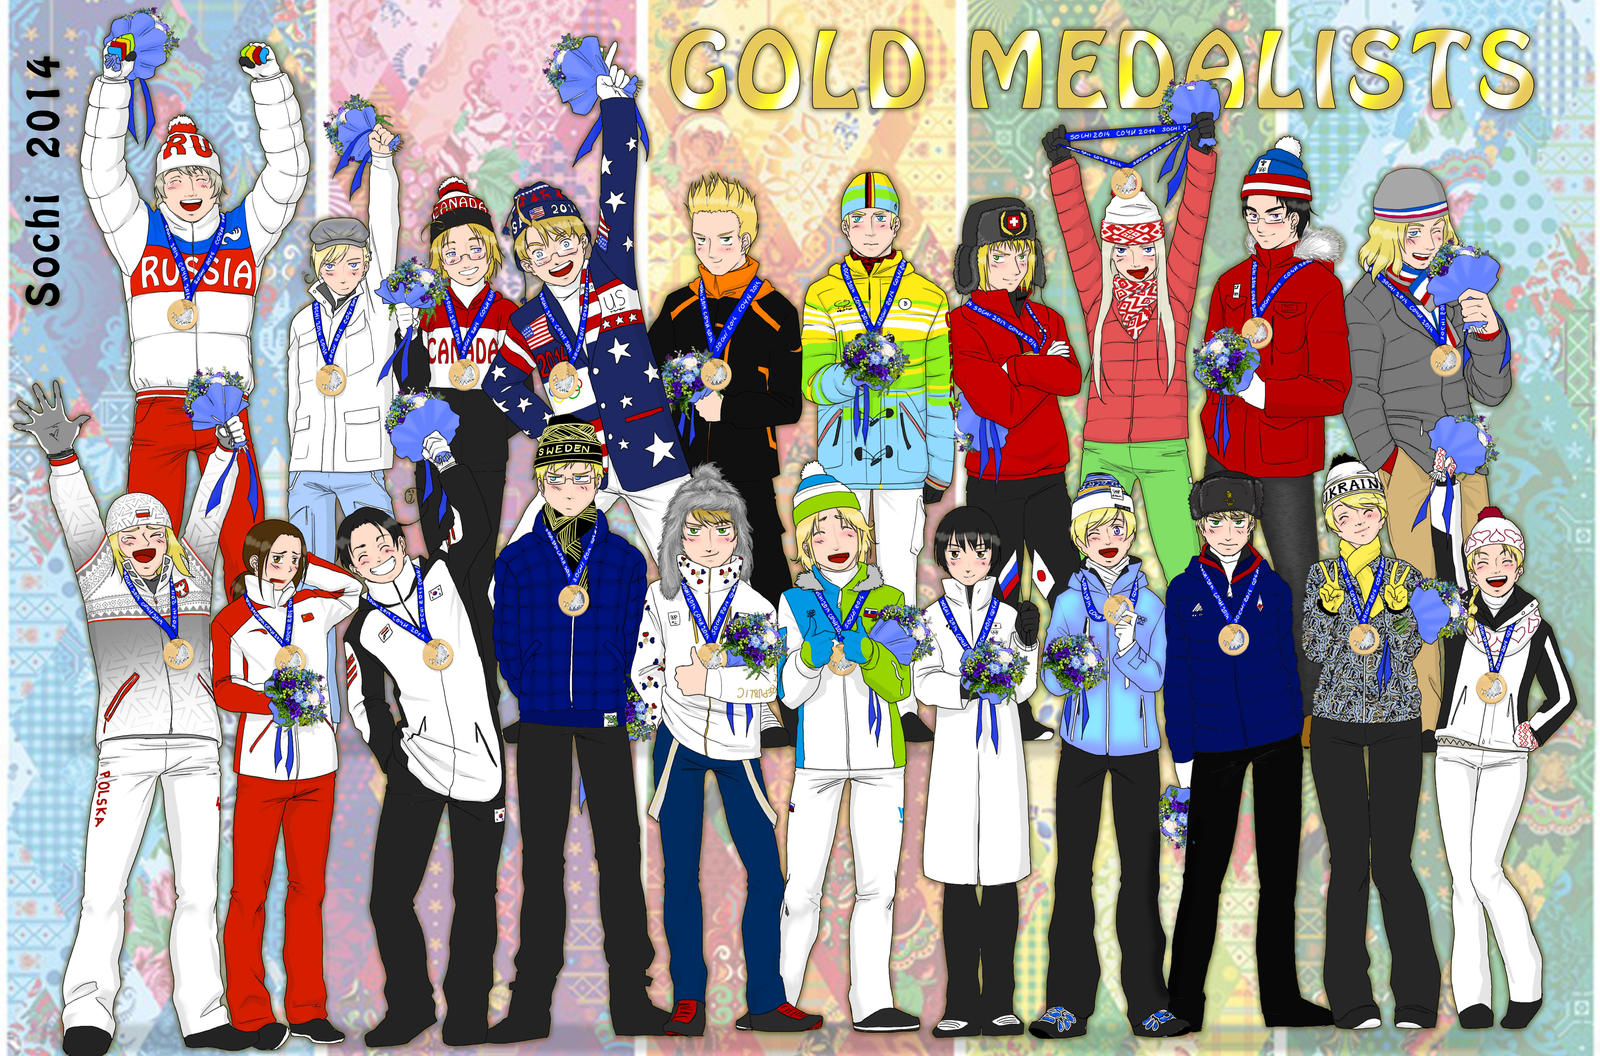 Golden Medalist of sochi by Janemin